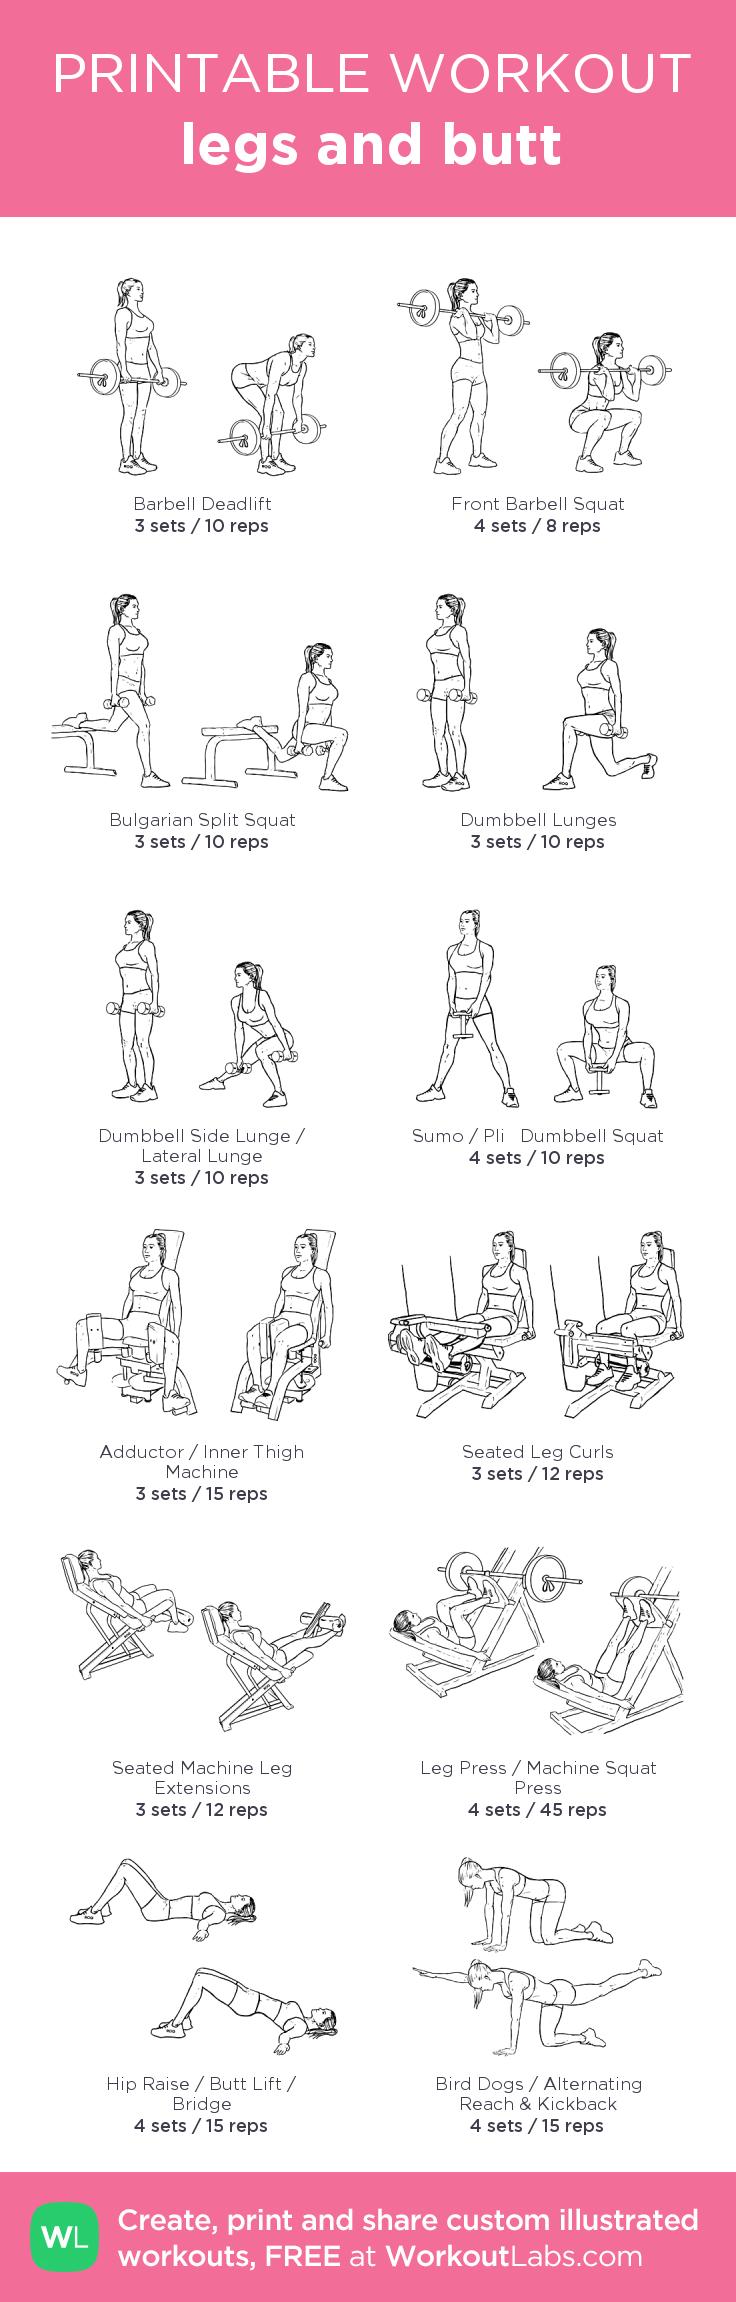 Those Women s butt workout